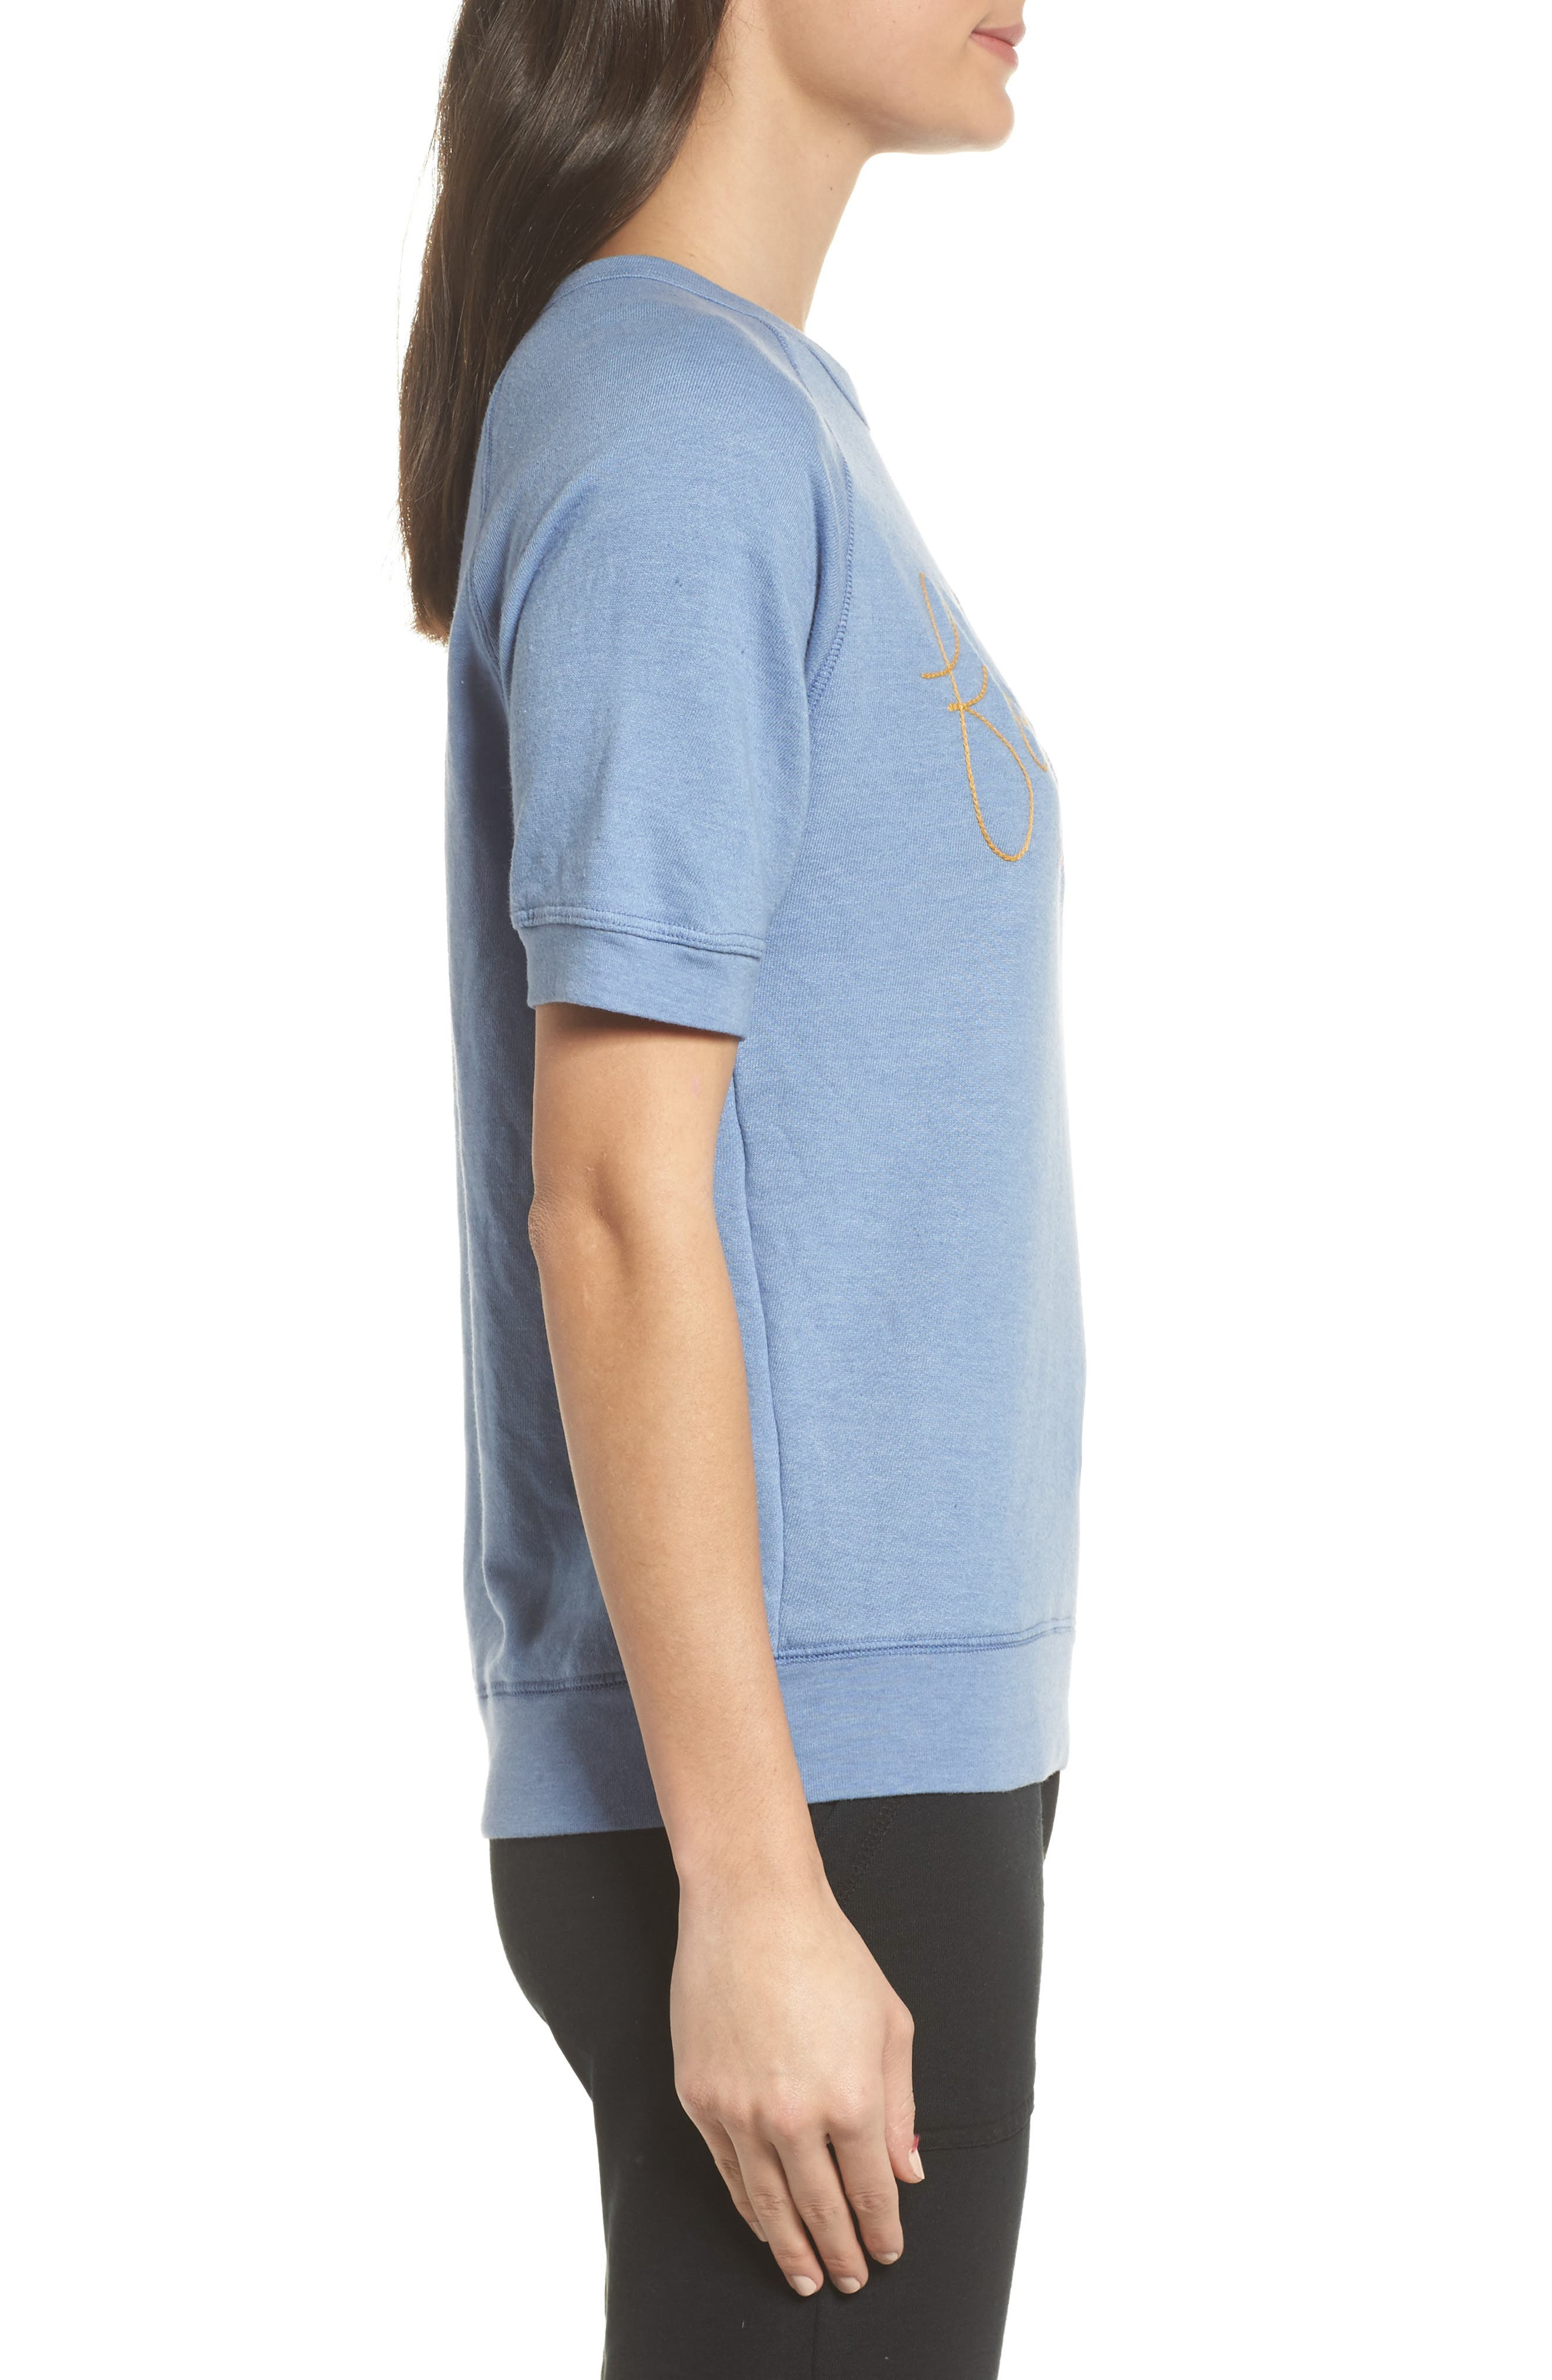 Alternate Image 3  - Junk Food Forever Short Sleeve Sweatshirt (Nordstrom Exclusive)